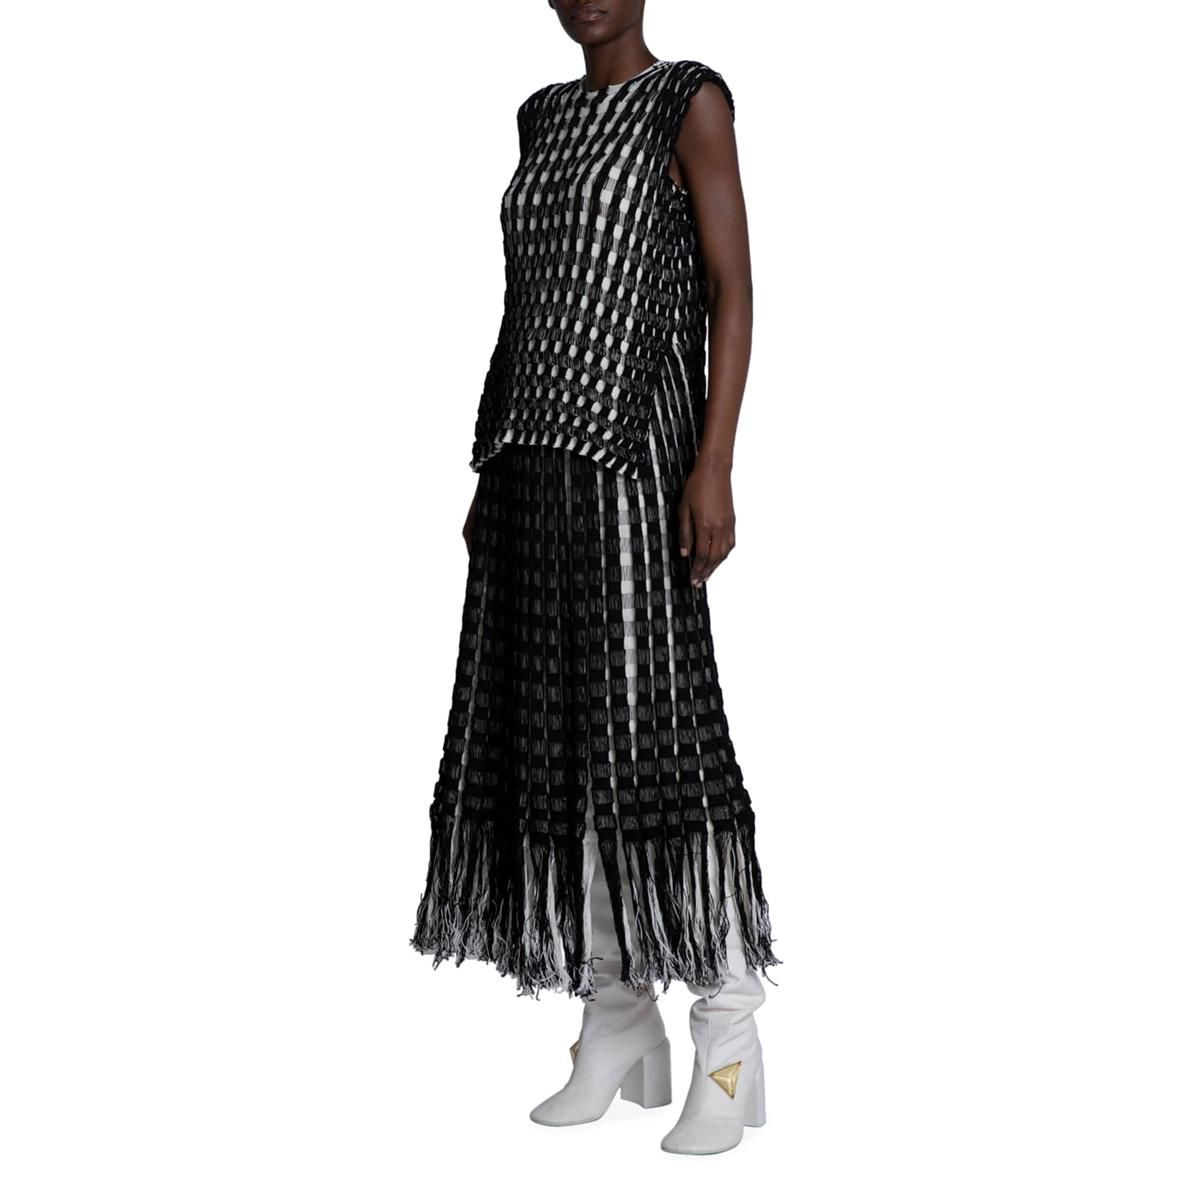 jil sander plaid woven skirt with fringe trim